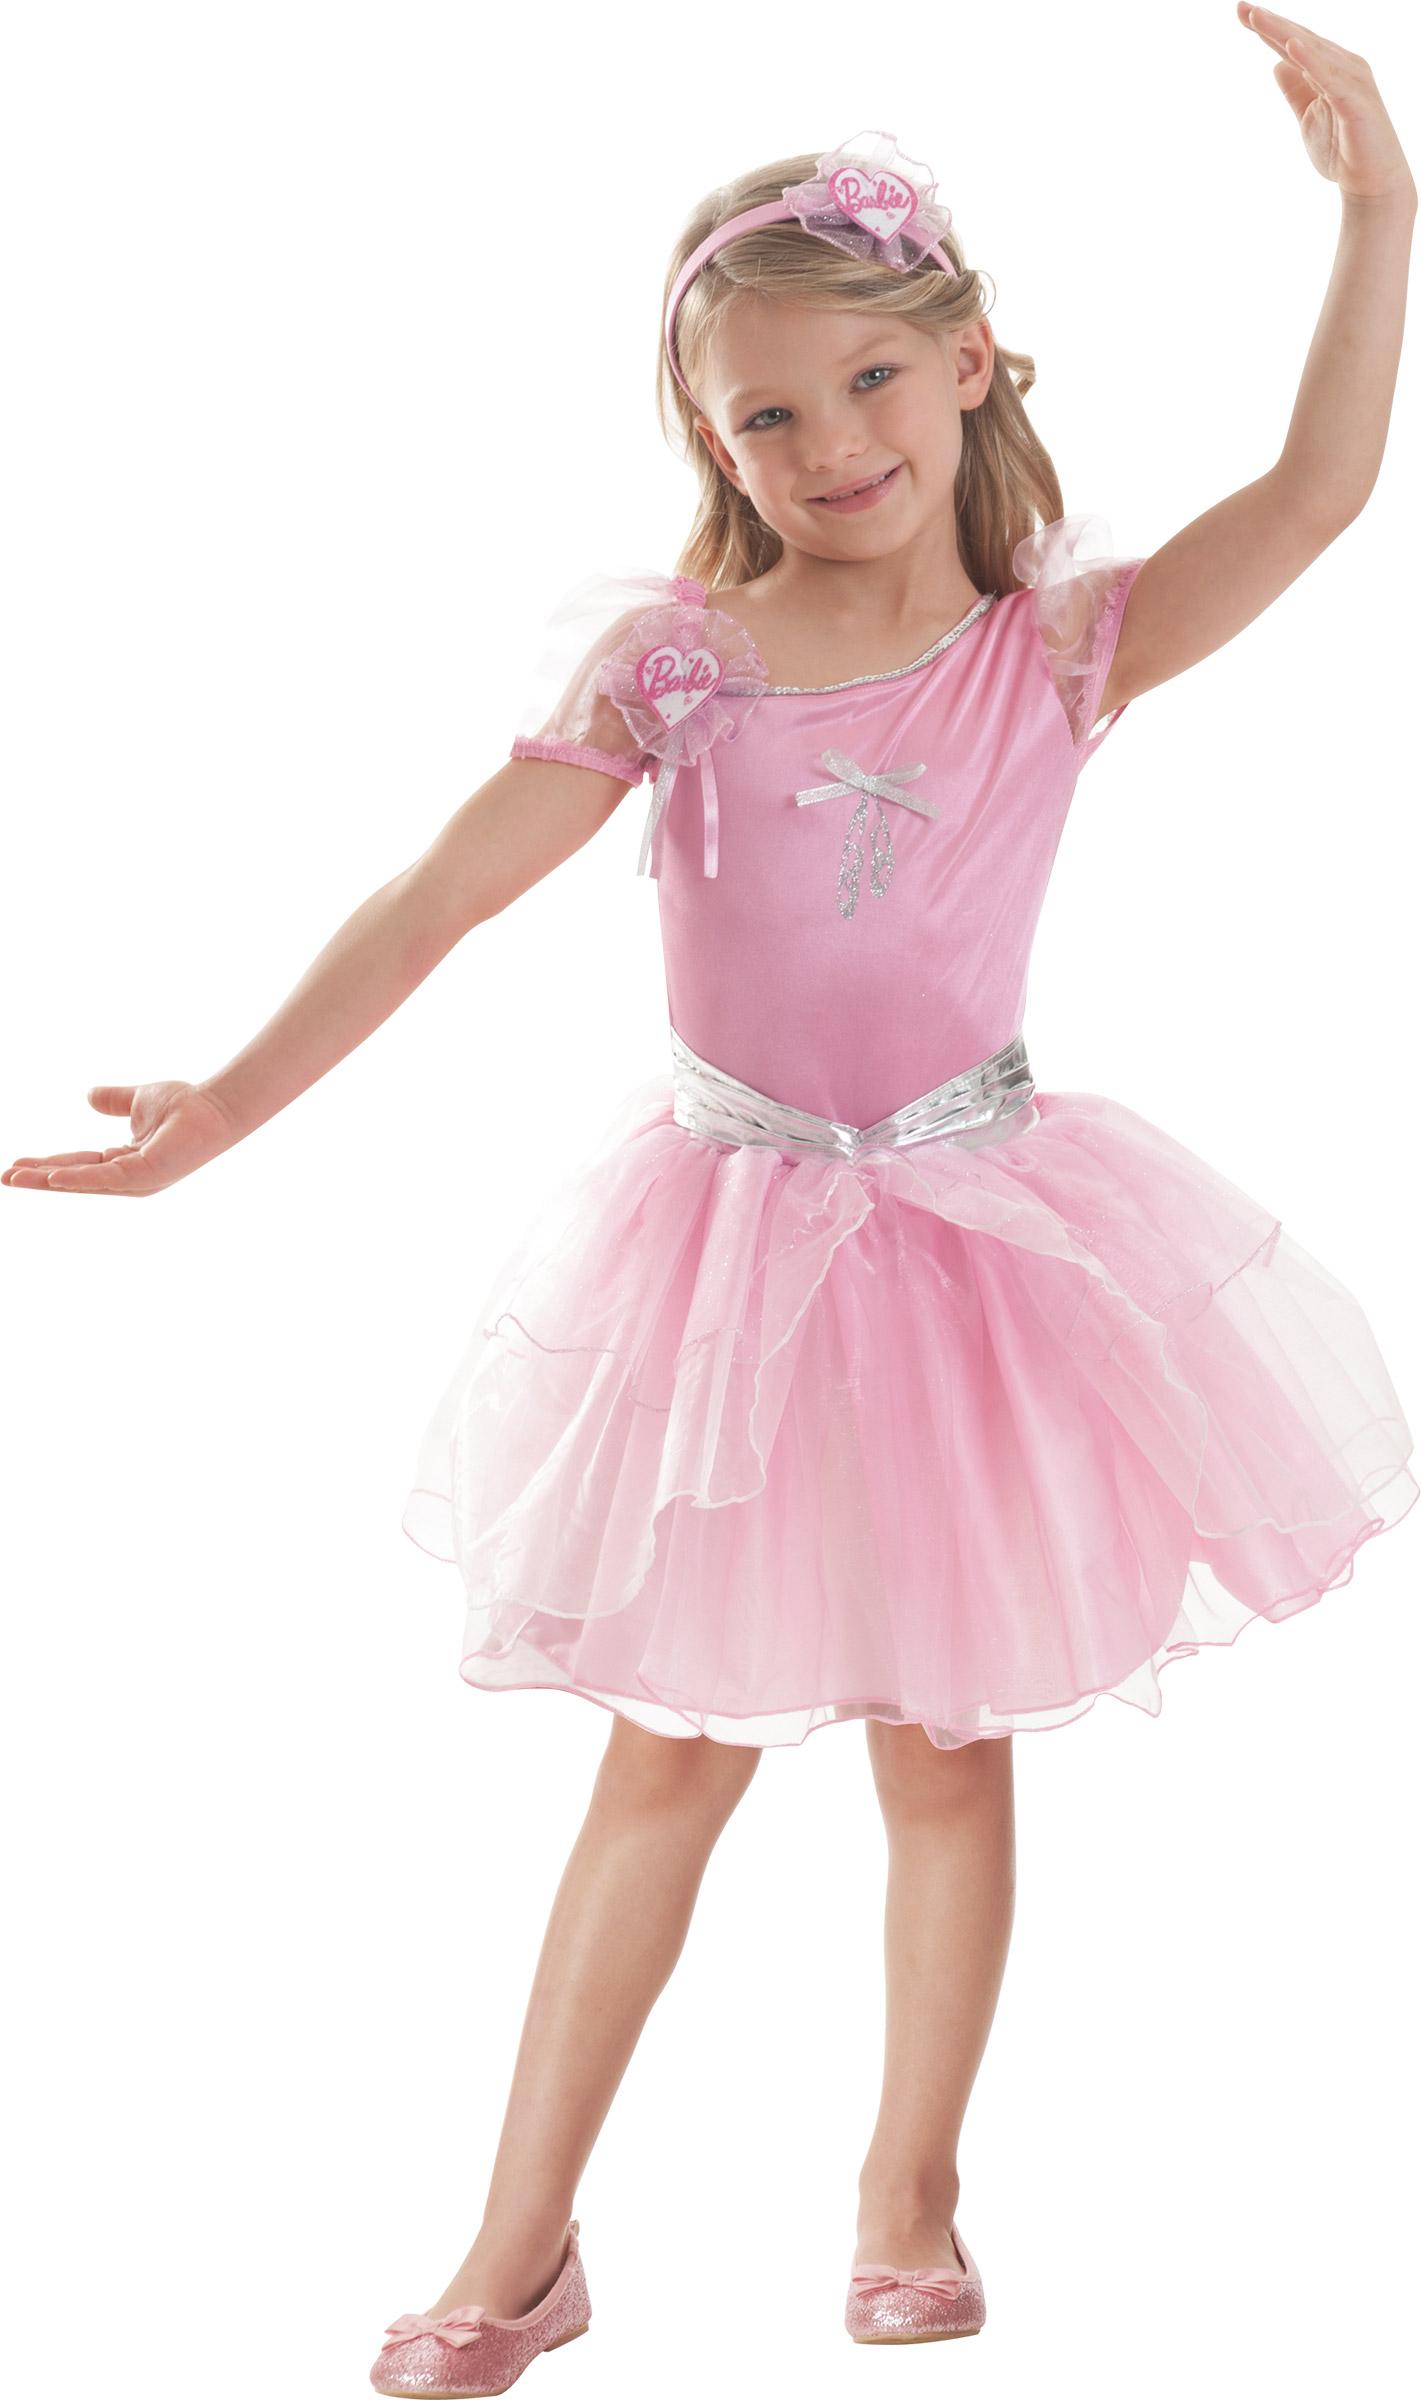 D guisement barbie ballerine fille deguise toi achat - Barbie ballerine ...